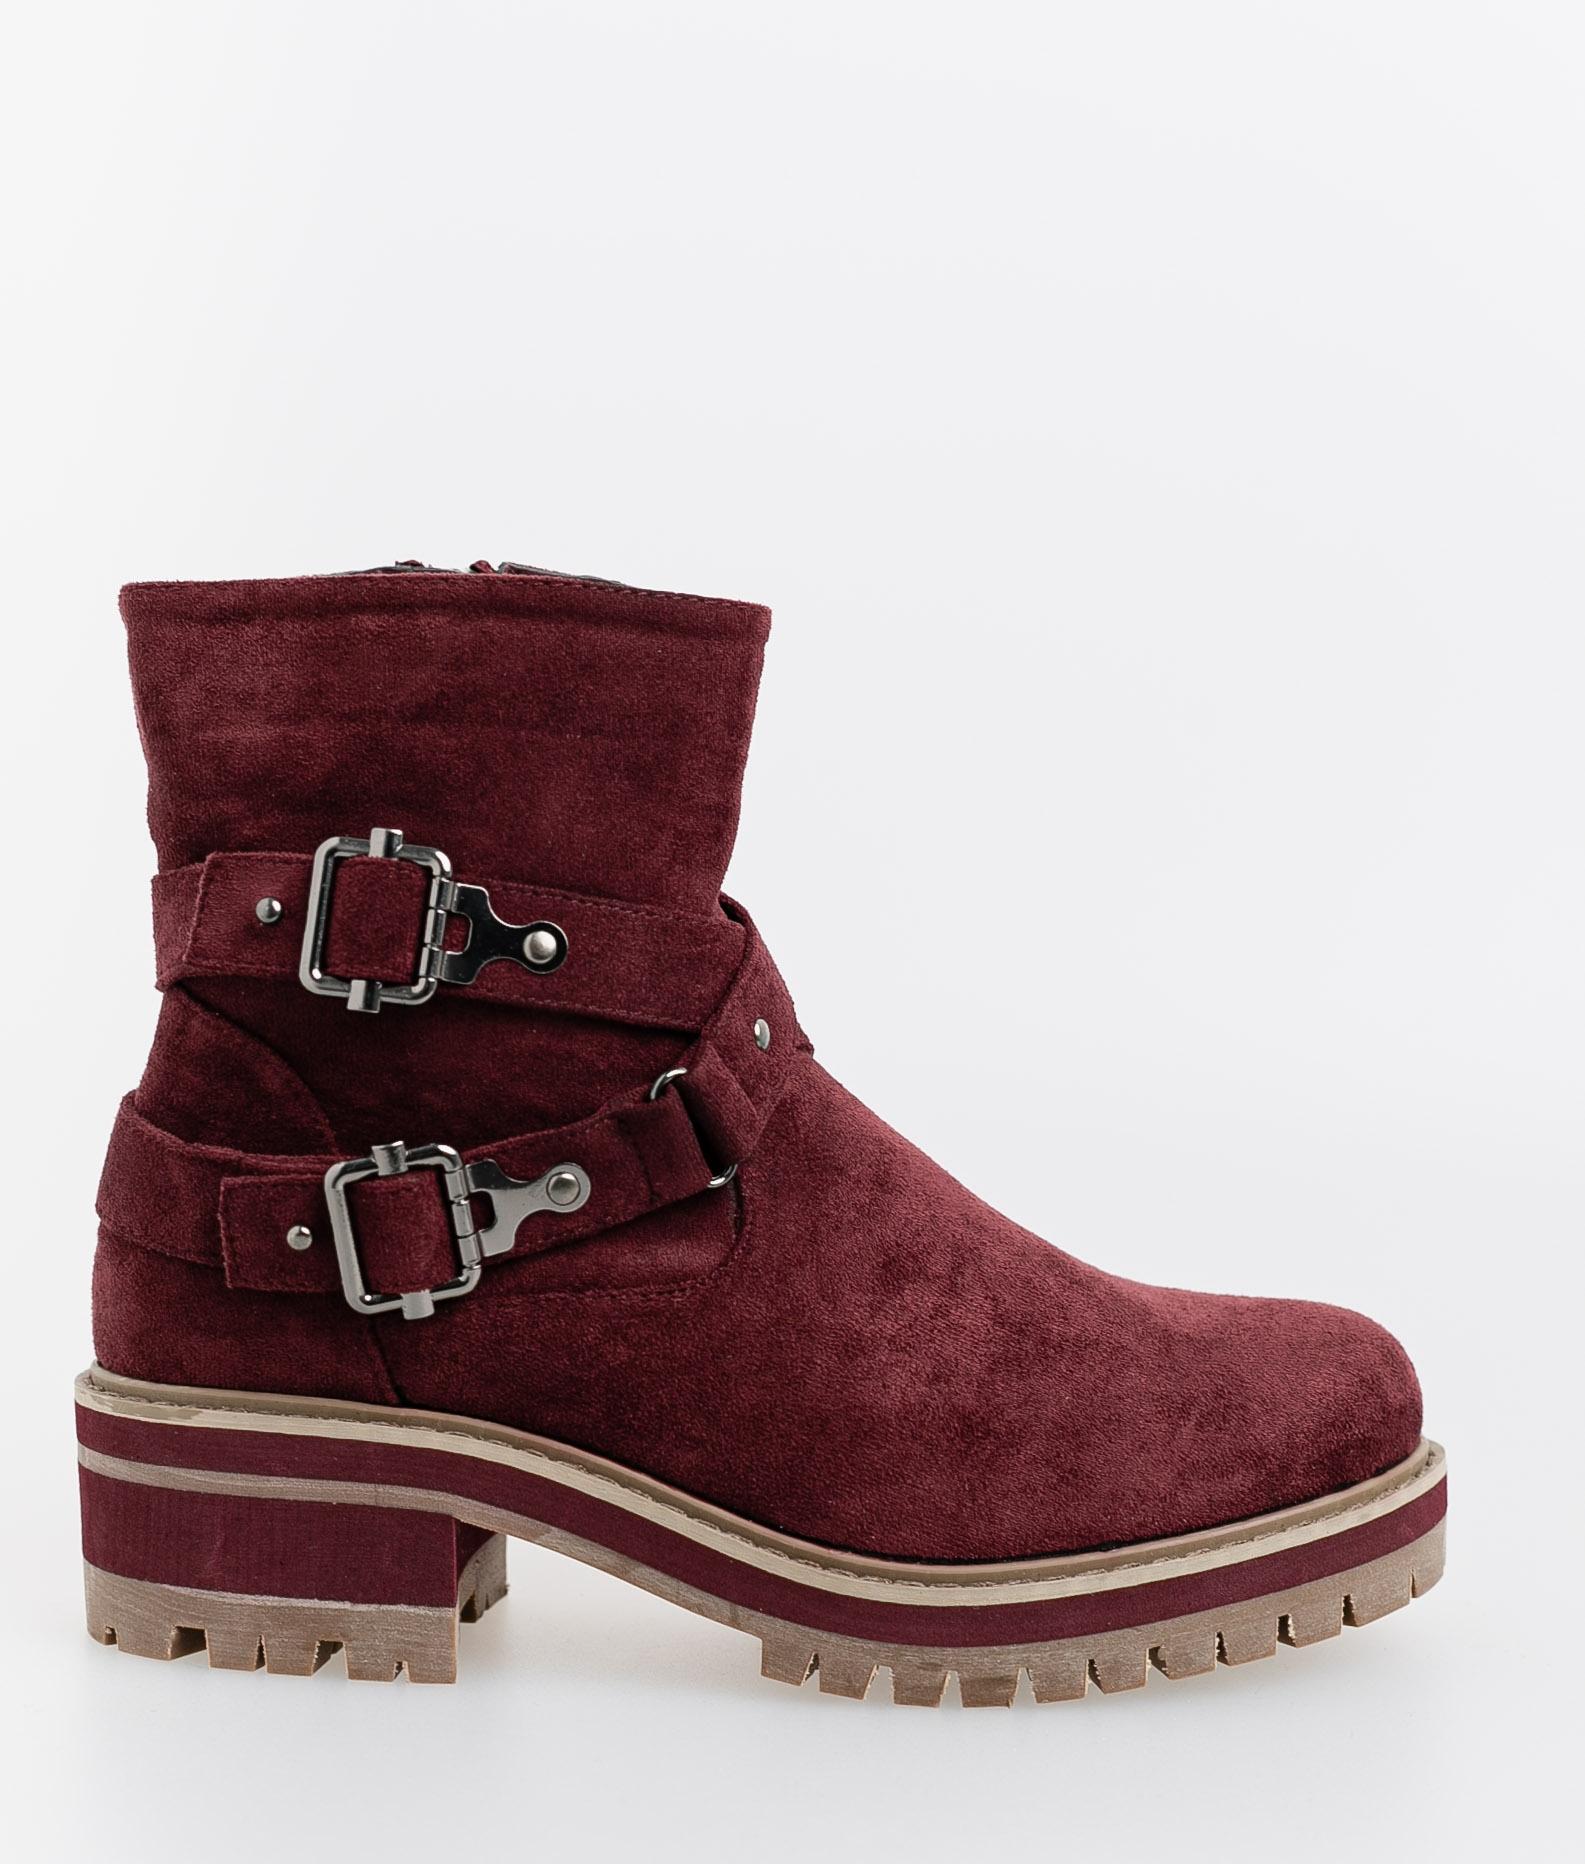 Brati Low Boot - Garnet